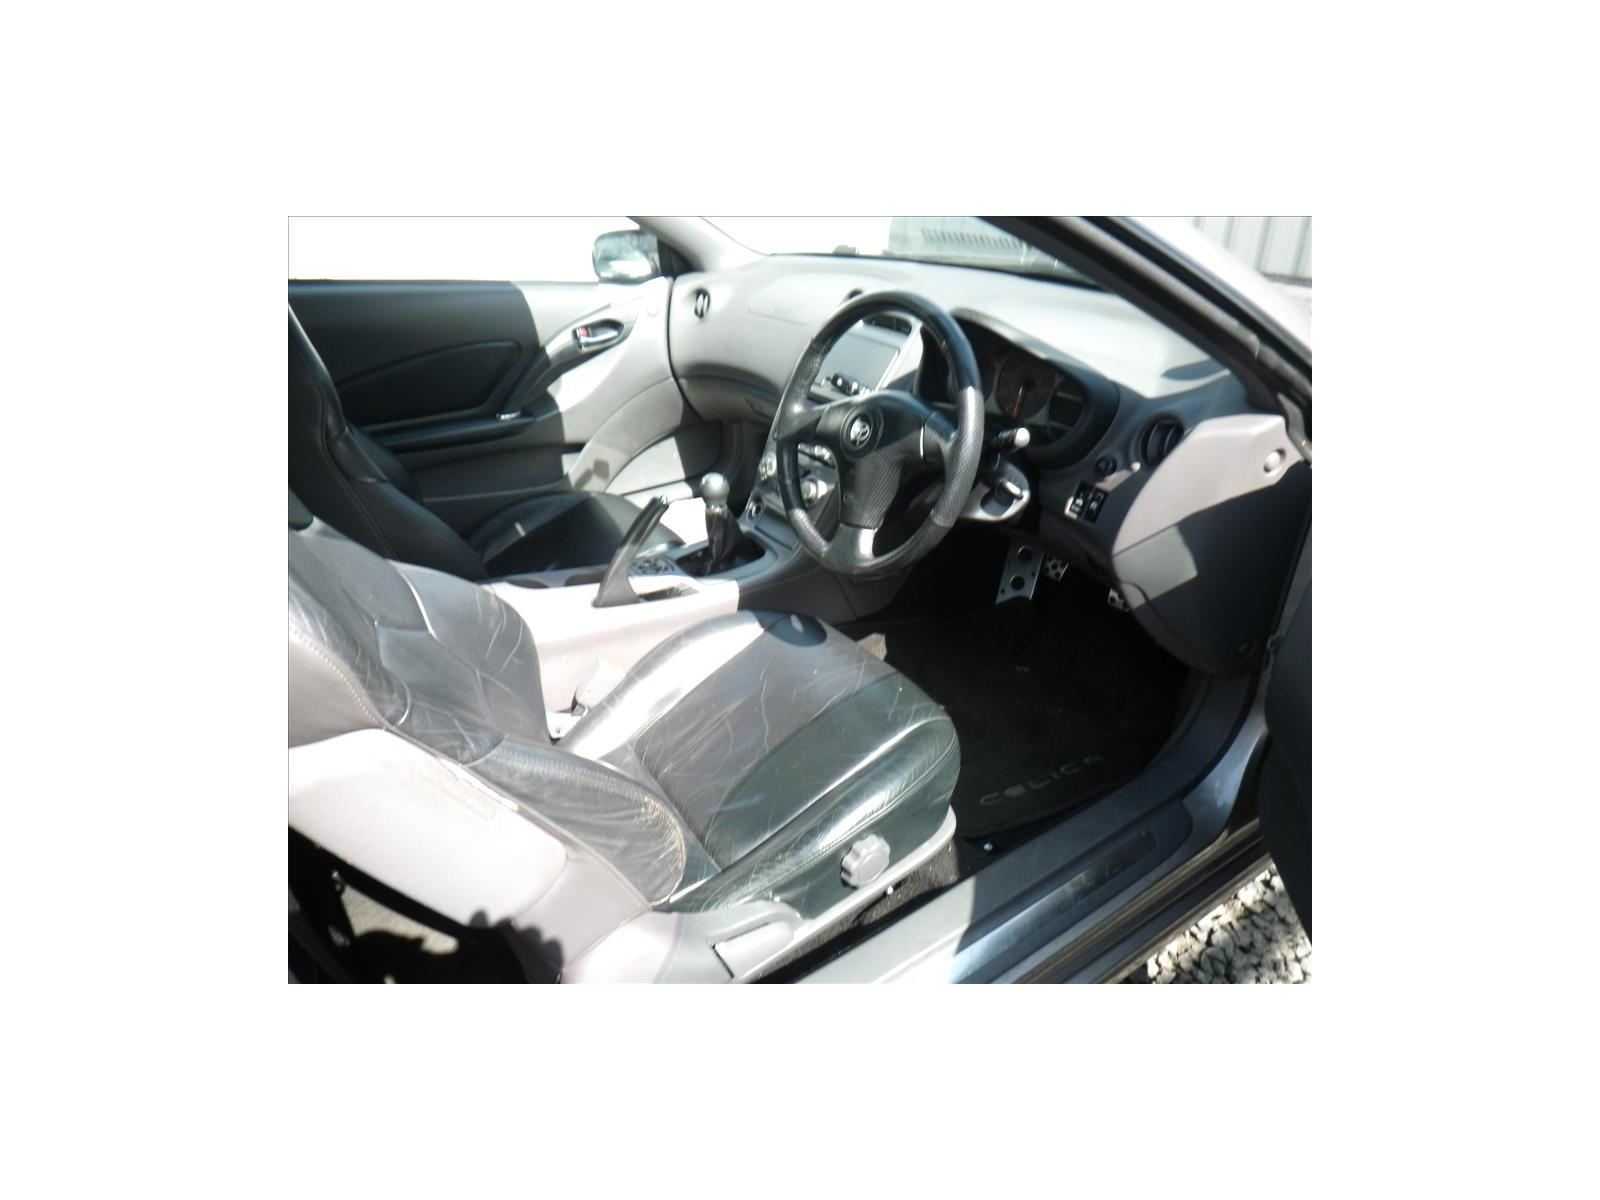 Toyota Celica 1999 To 2006 Alternator Petrol Manual For Sale Wiring Diagram 2001 190 18l Car